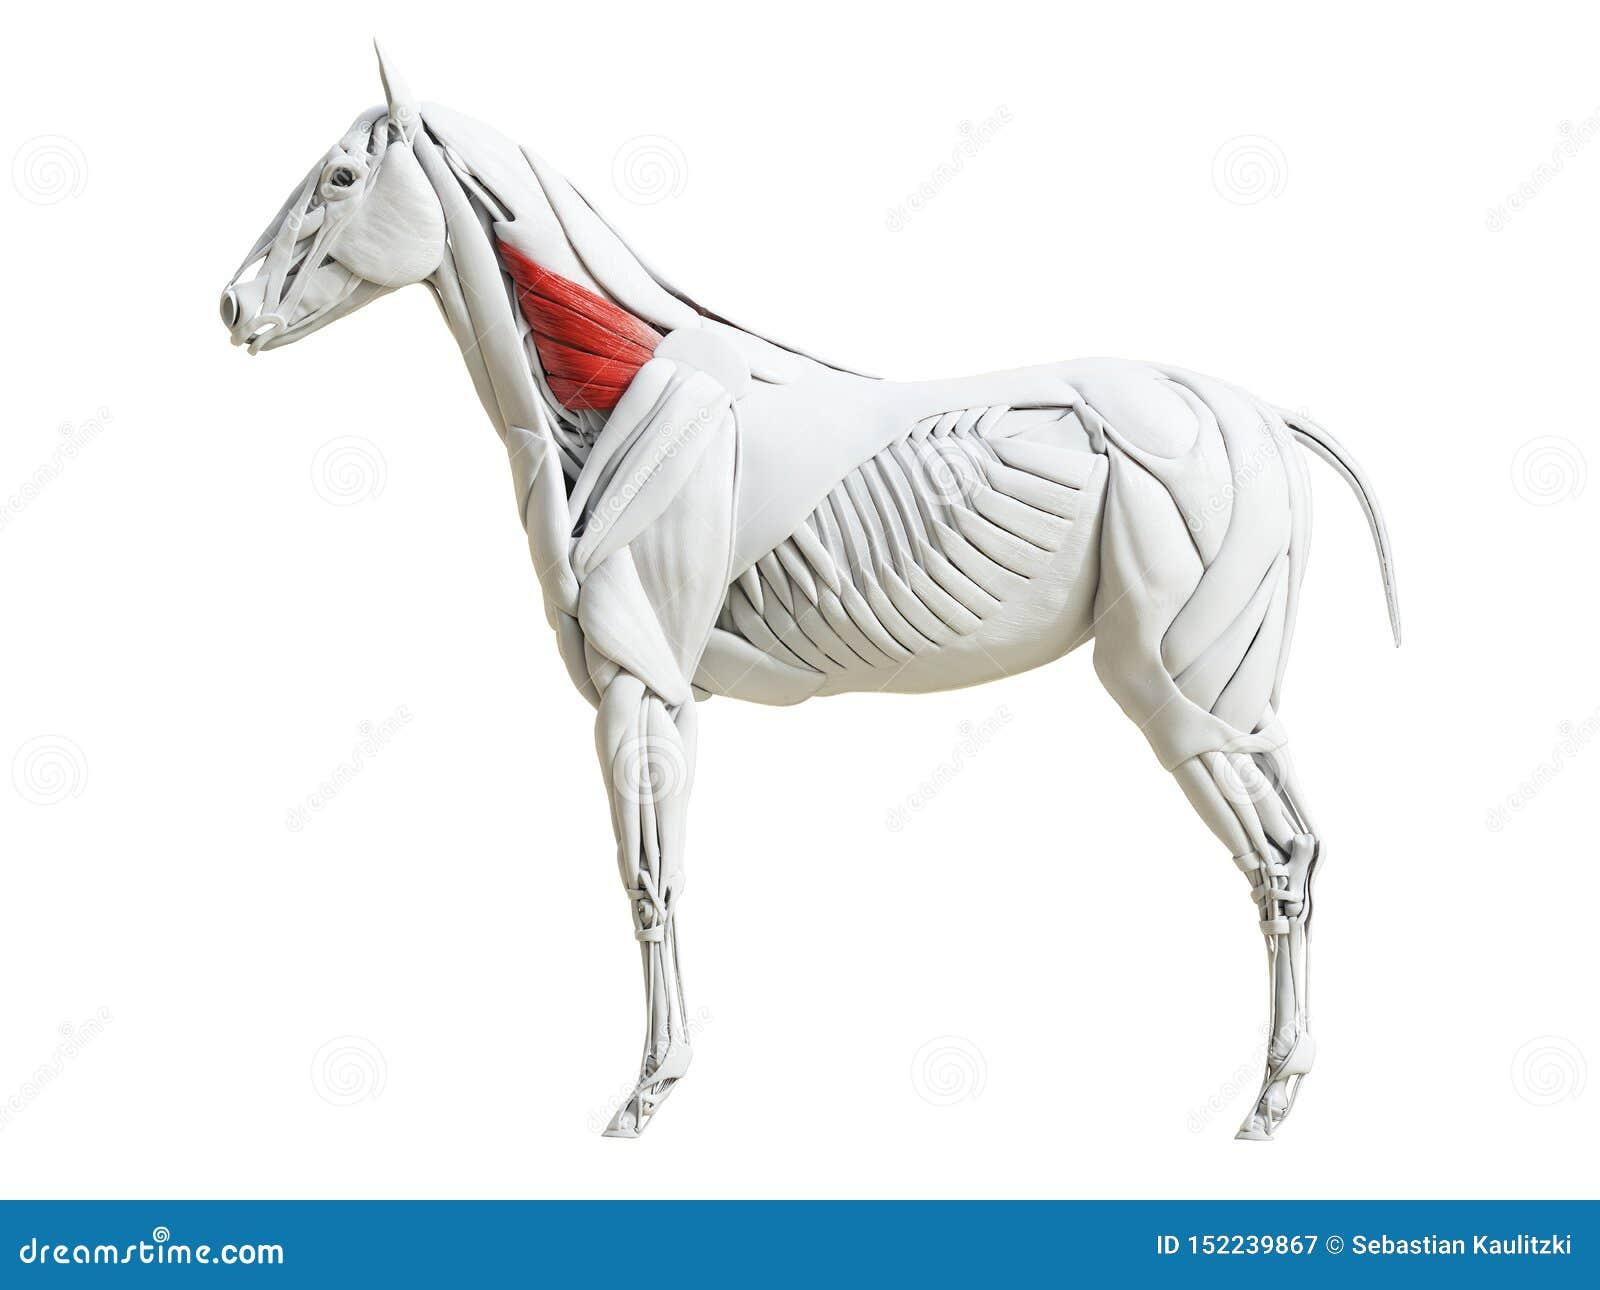 Equine анатомия мышцы - ventralis serratus